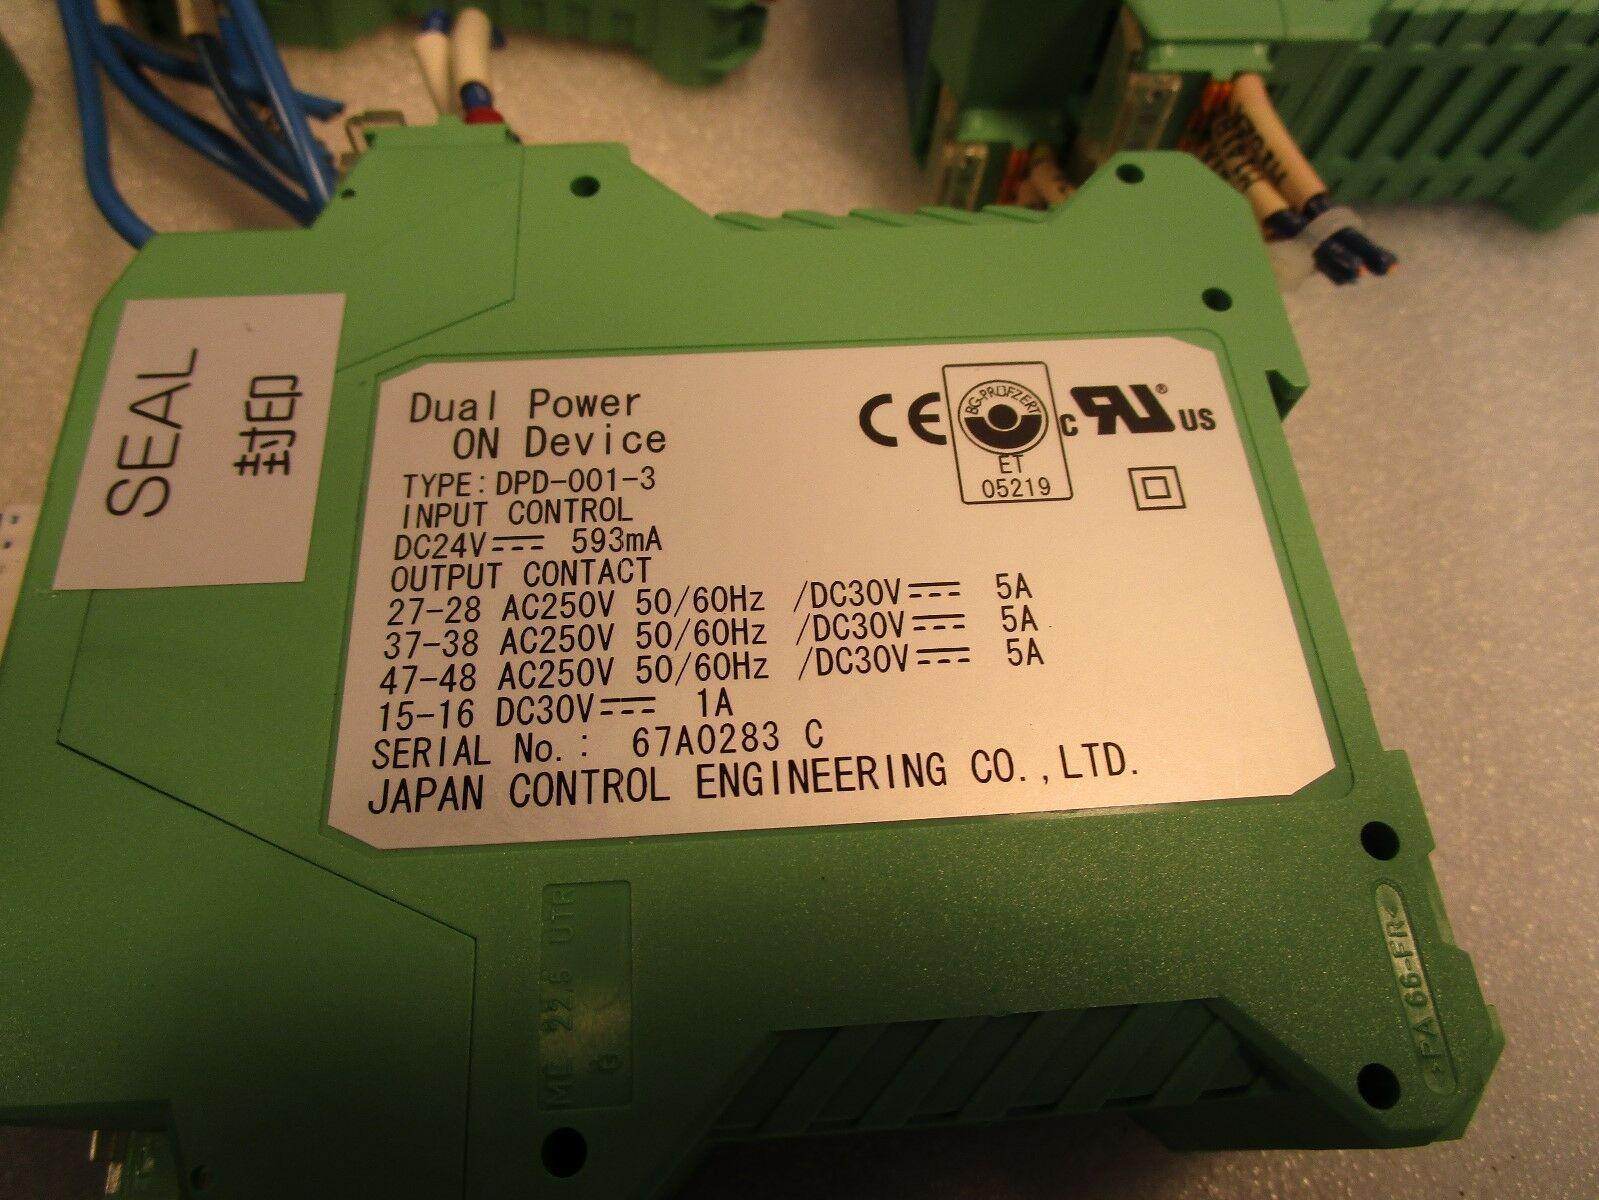 JSK Co Japan Control Engineering JCE DPD-001-3 Dual Power On Device